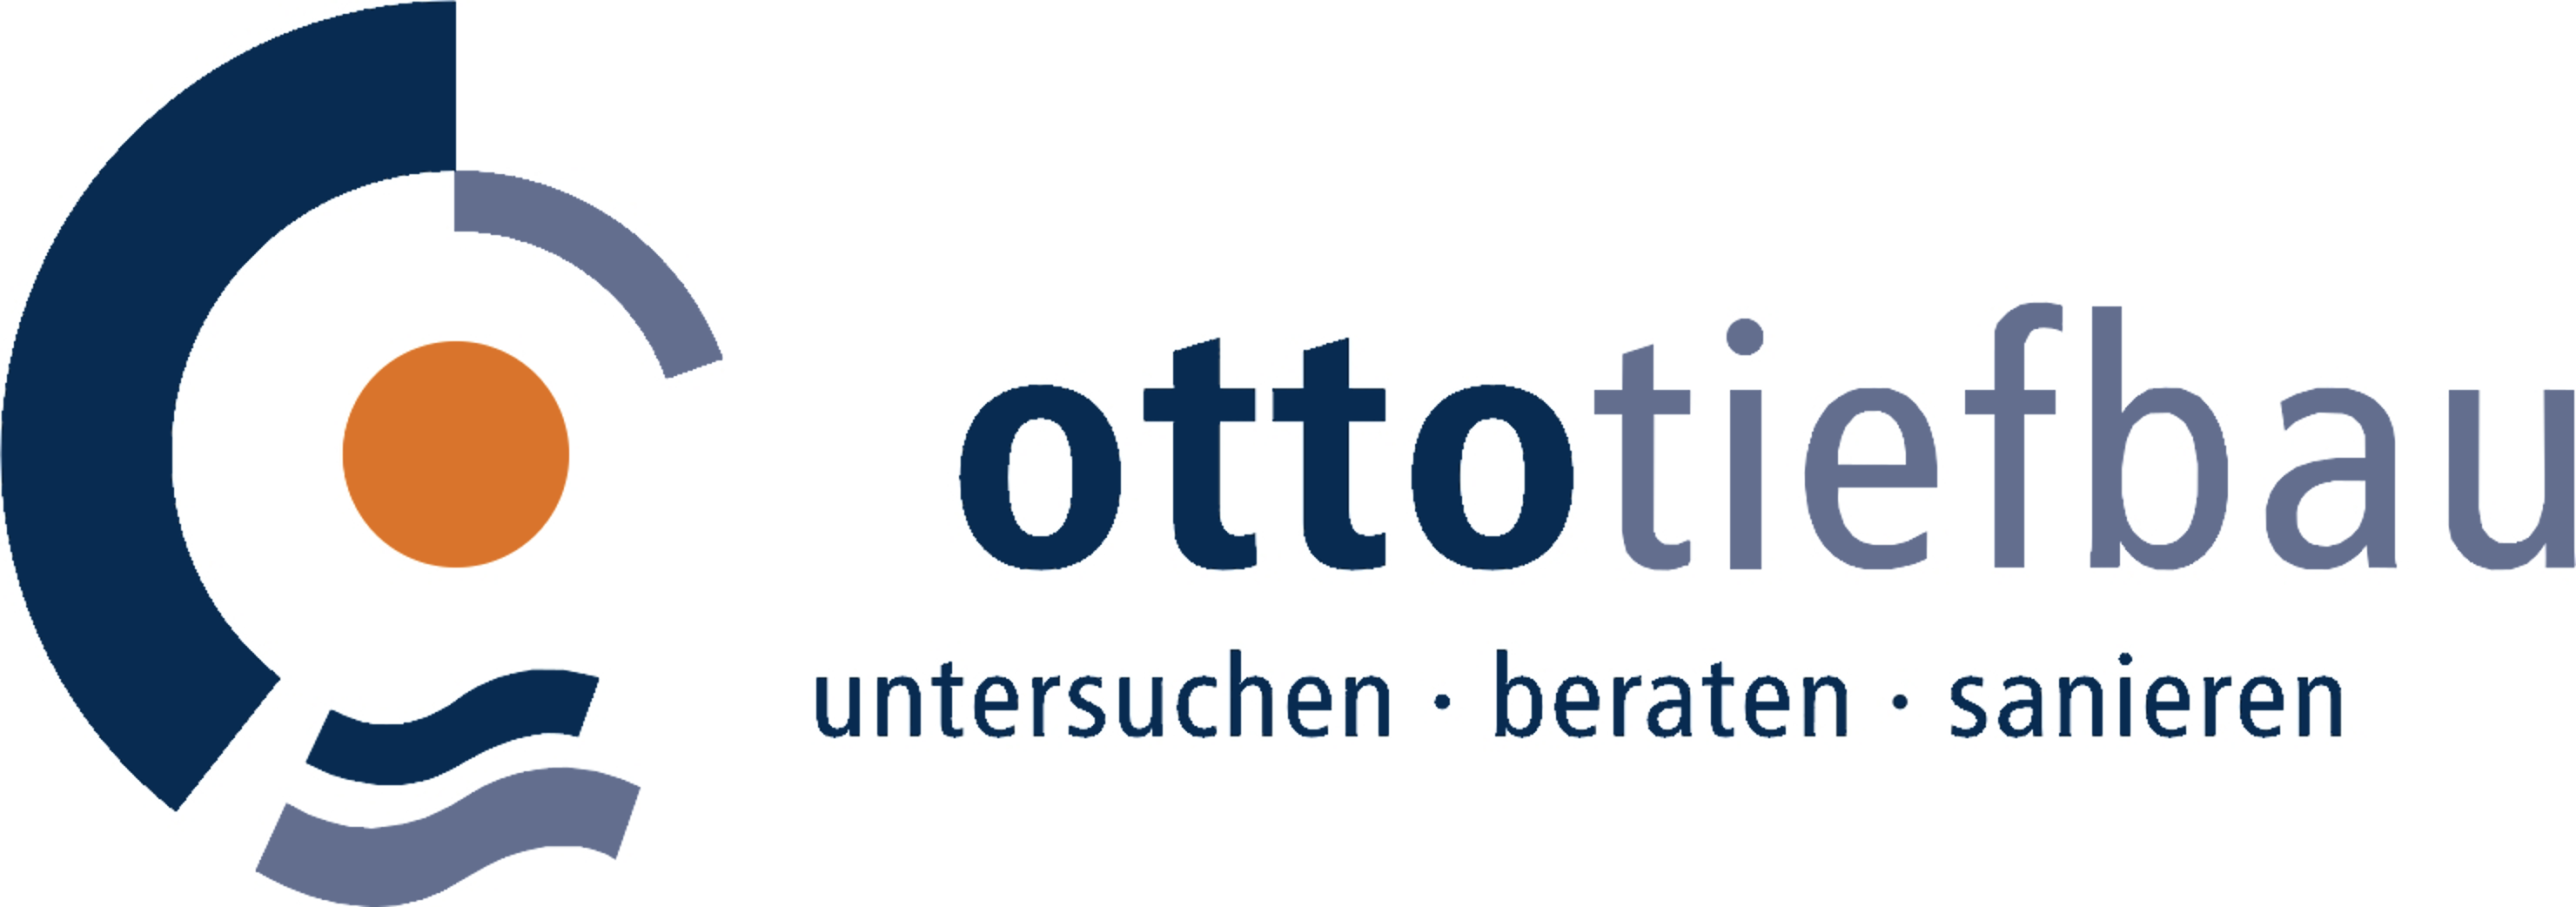 Otto Tiefbau GmbH & Co. KG